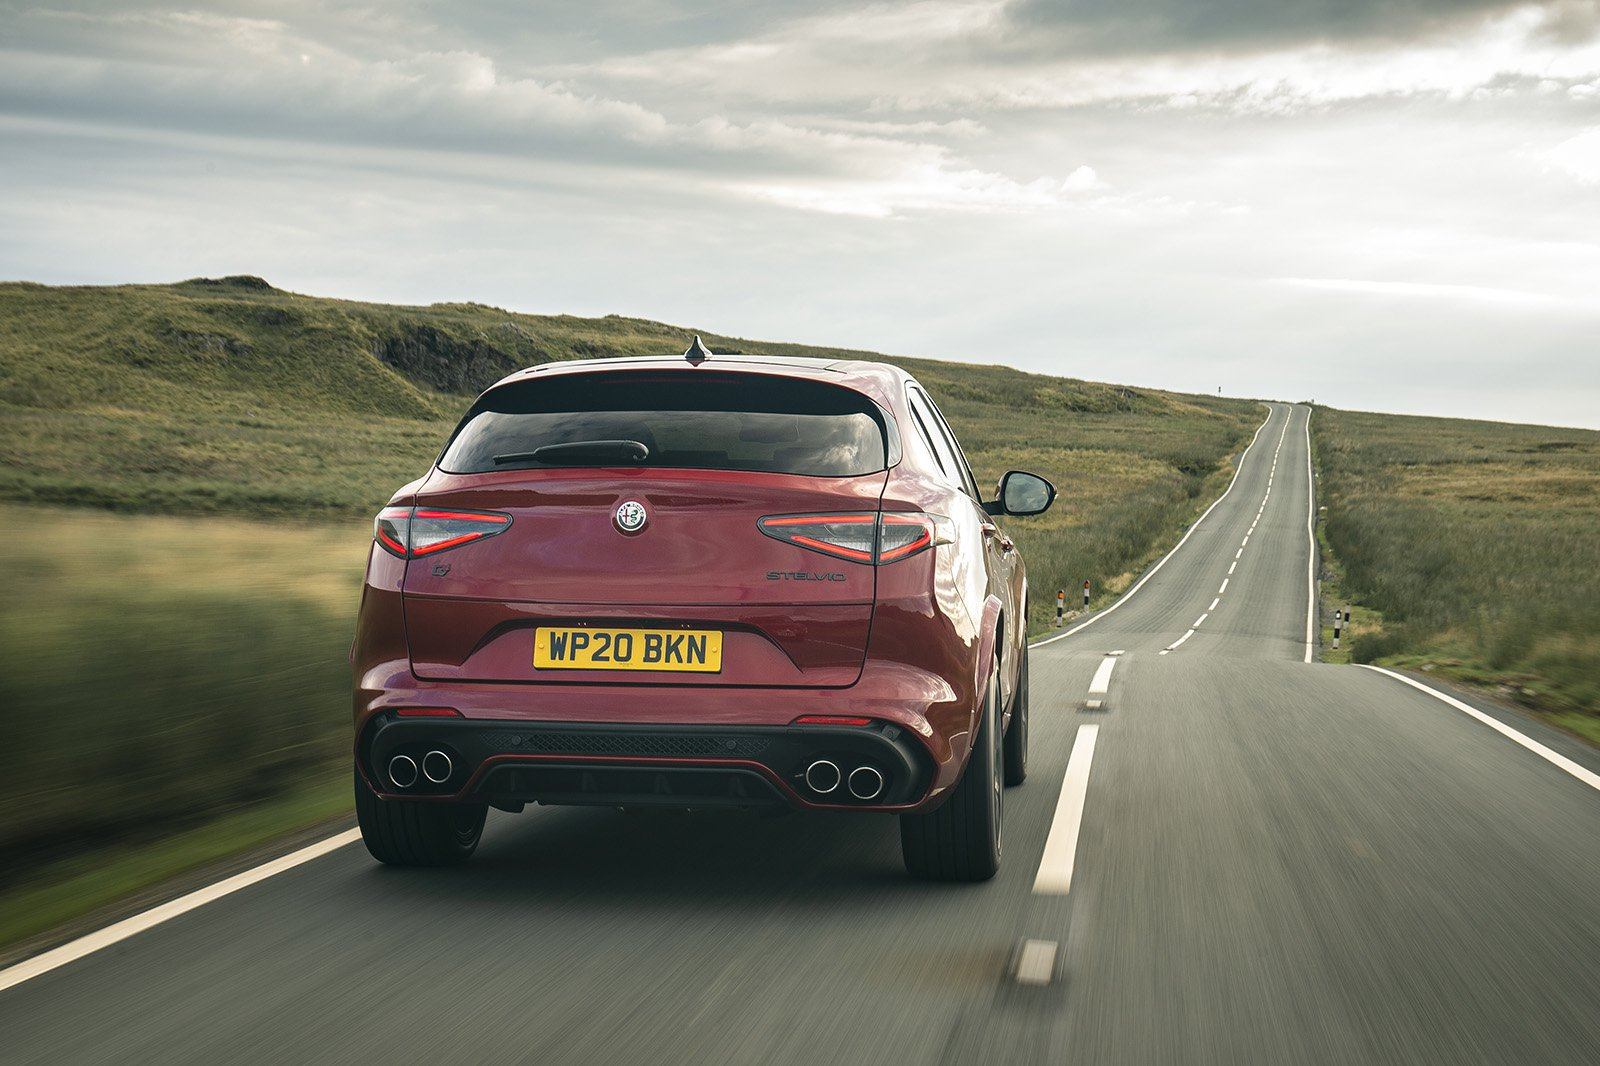 Alfa Romeo Stelvio Quadrifoglio 2020 rear tracking